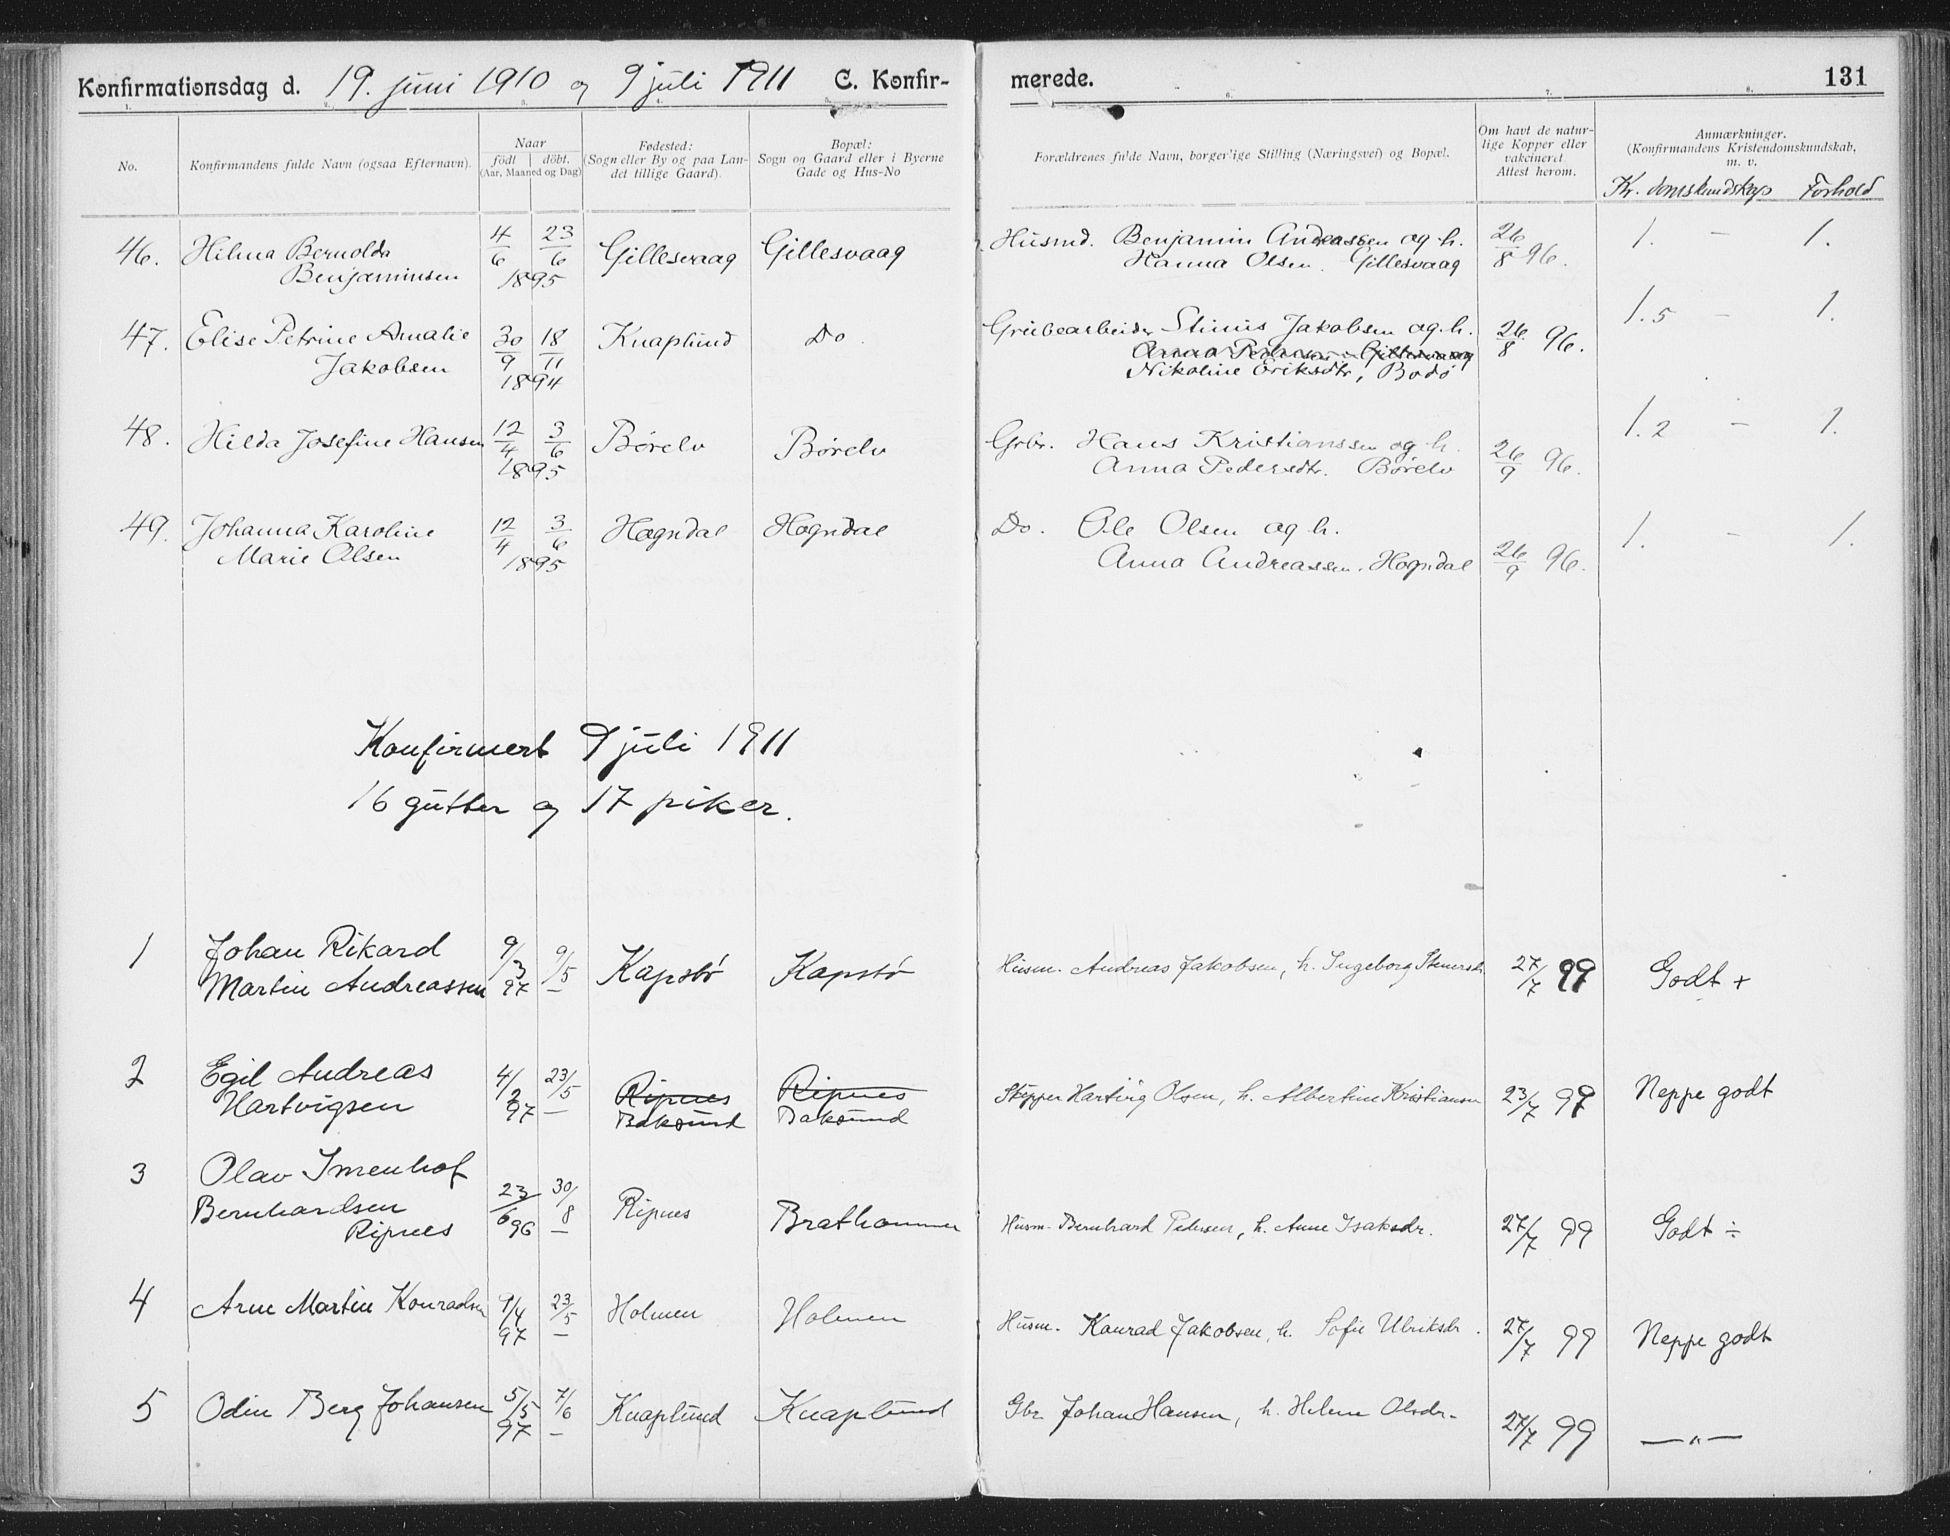 SAT, Ministerialprotokoller, klokkerbøker og fødselsregistre - Nordland, 804/L0081: Ministerialbok nr. 804A02, 1901-1915, s. 131